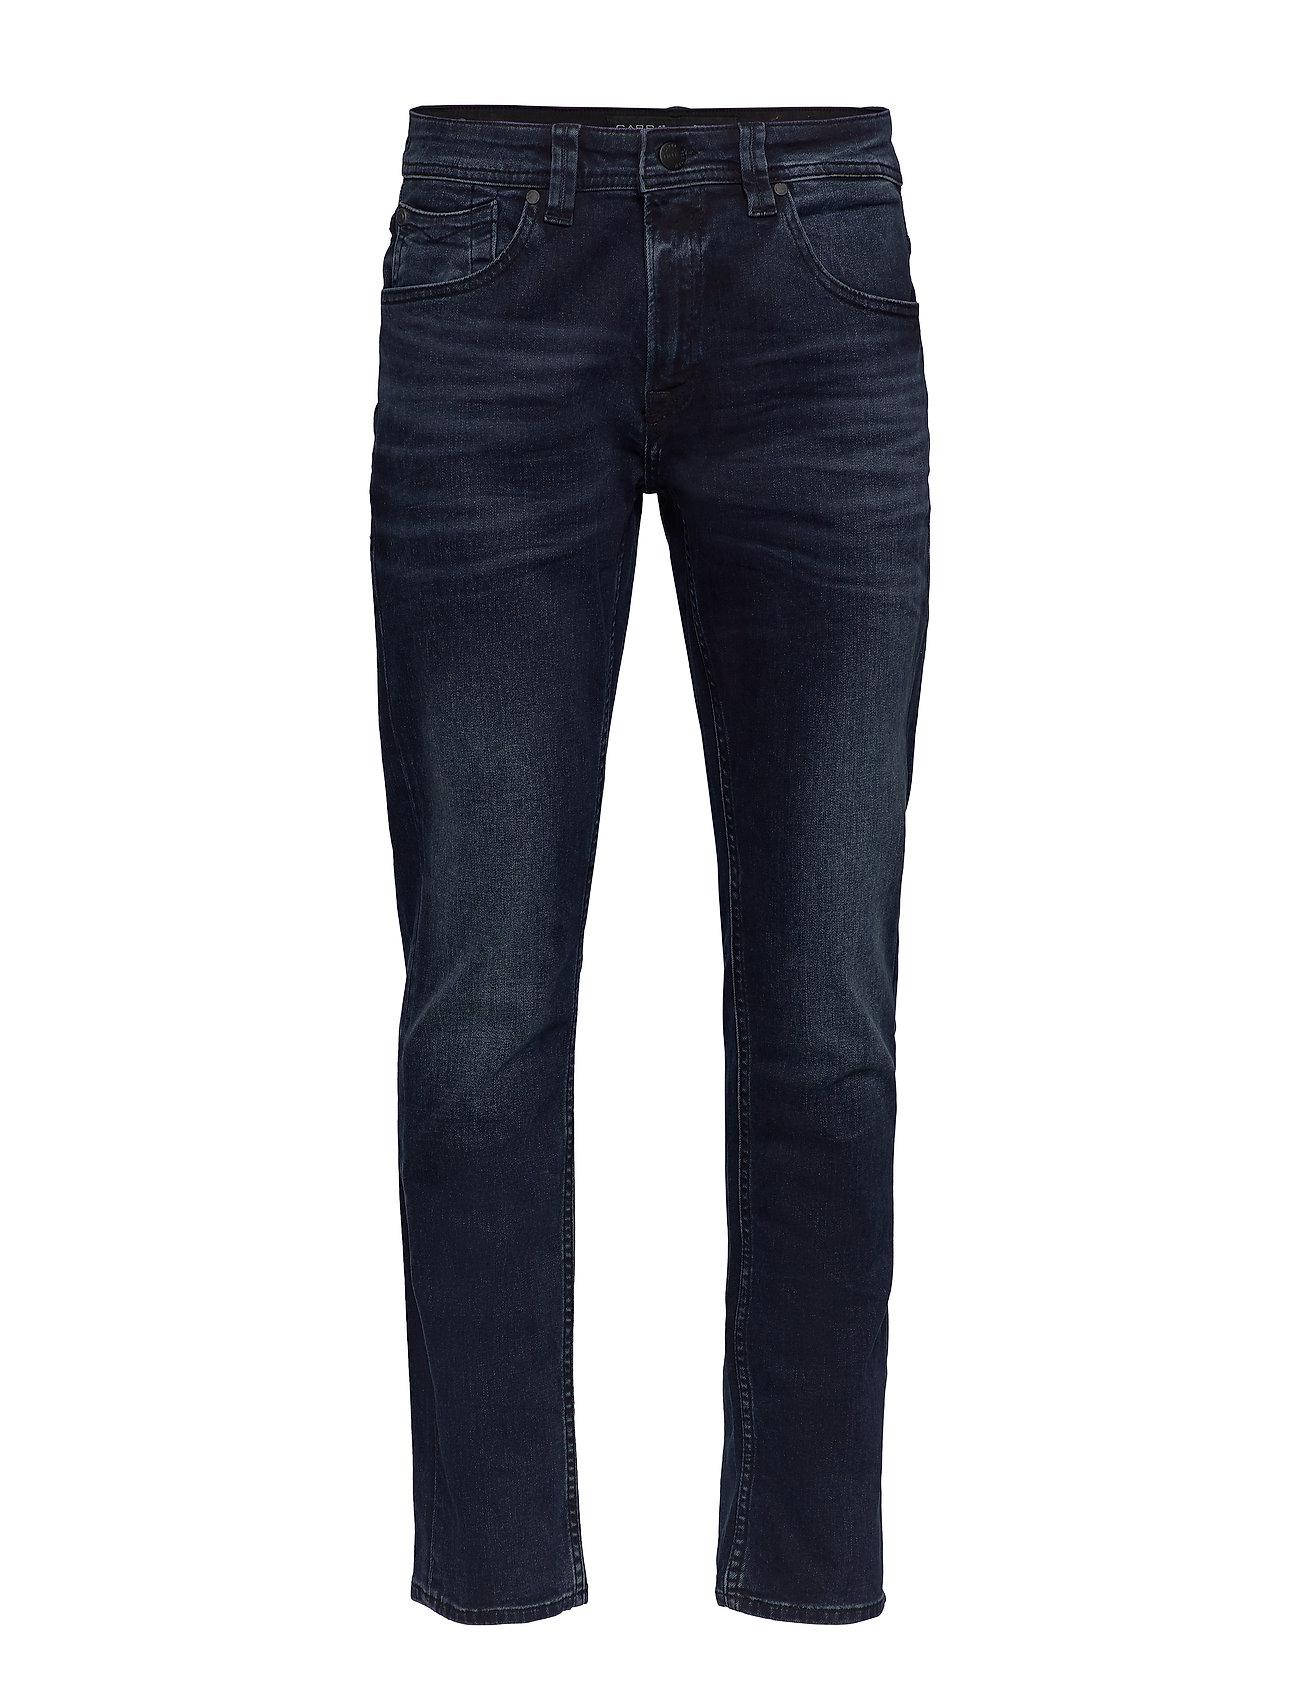 Image of Nico K3461 Jeans Blå Gabba (3361421829)